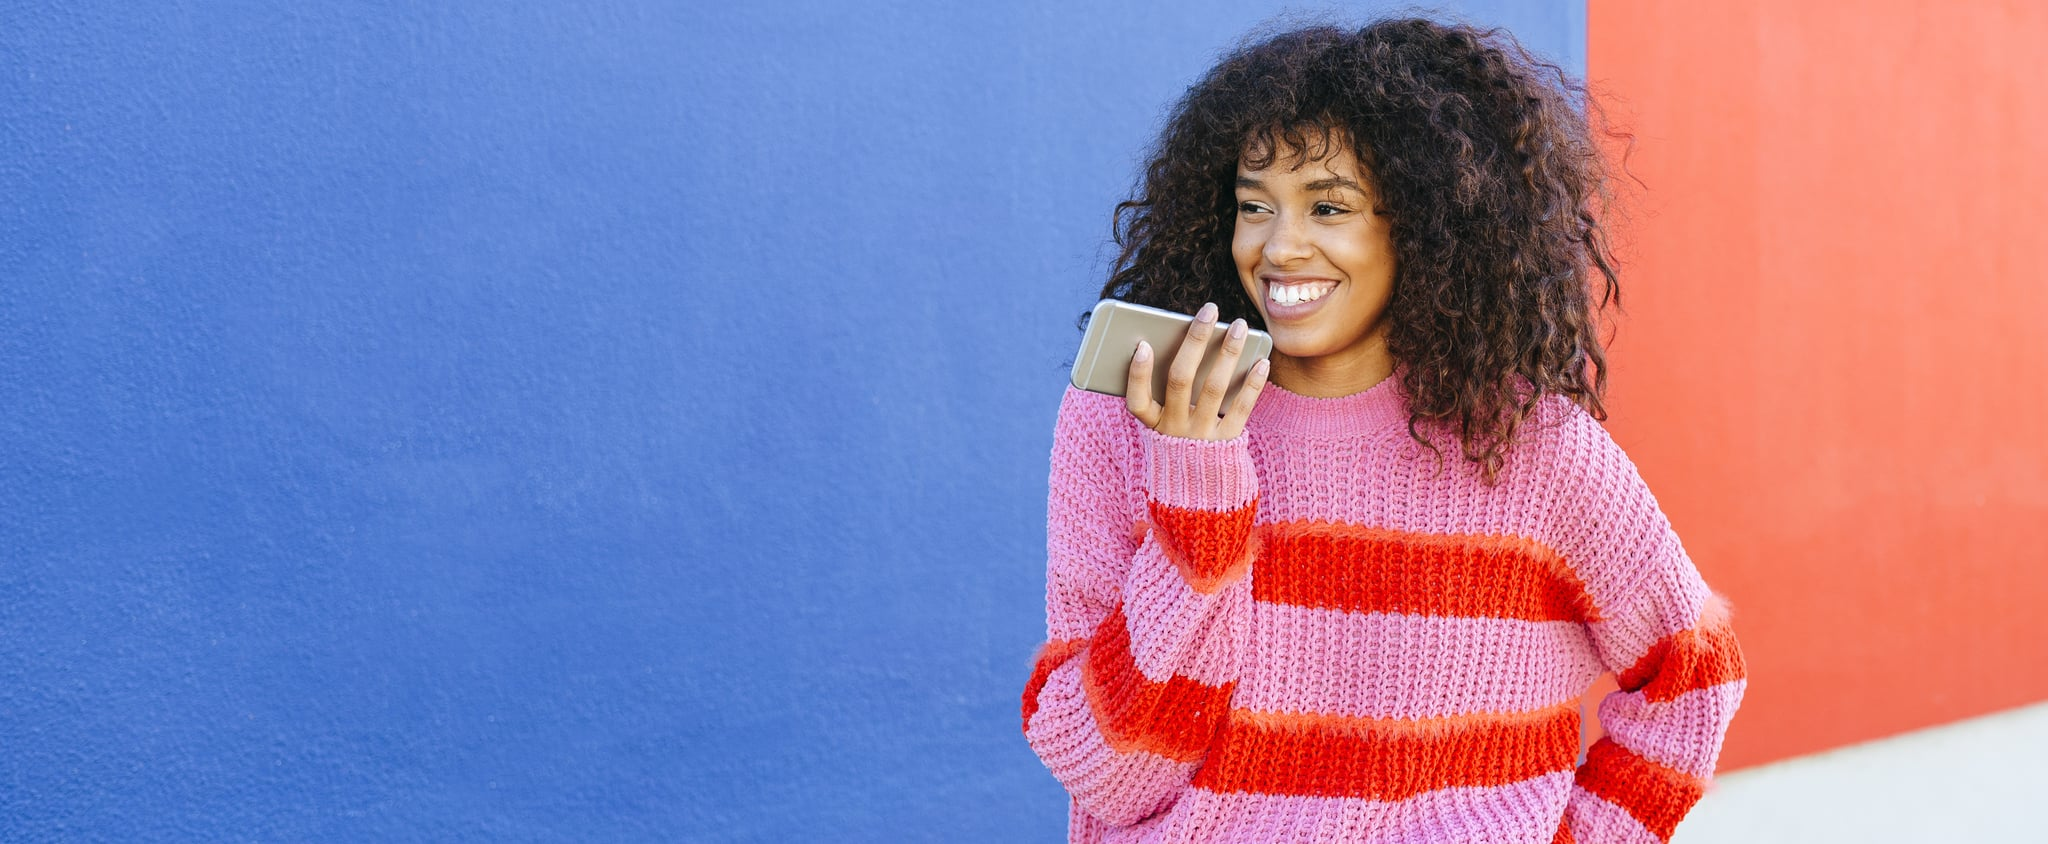 Self-Isolation Has Made Me Love Phone Calls Again